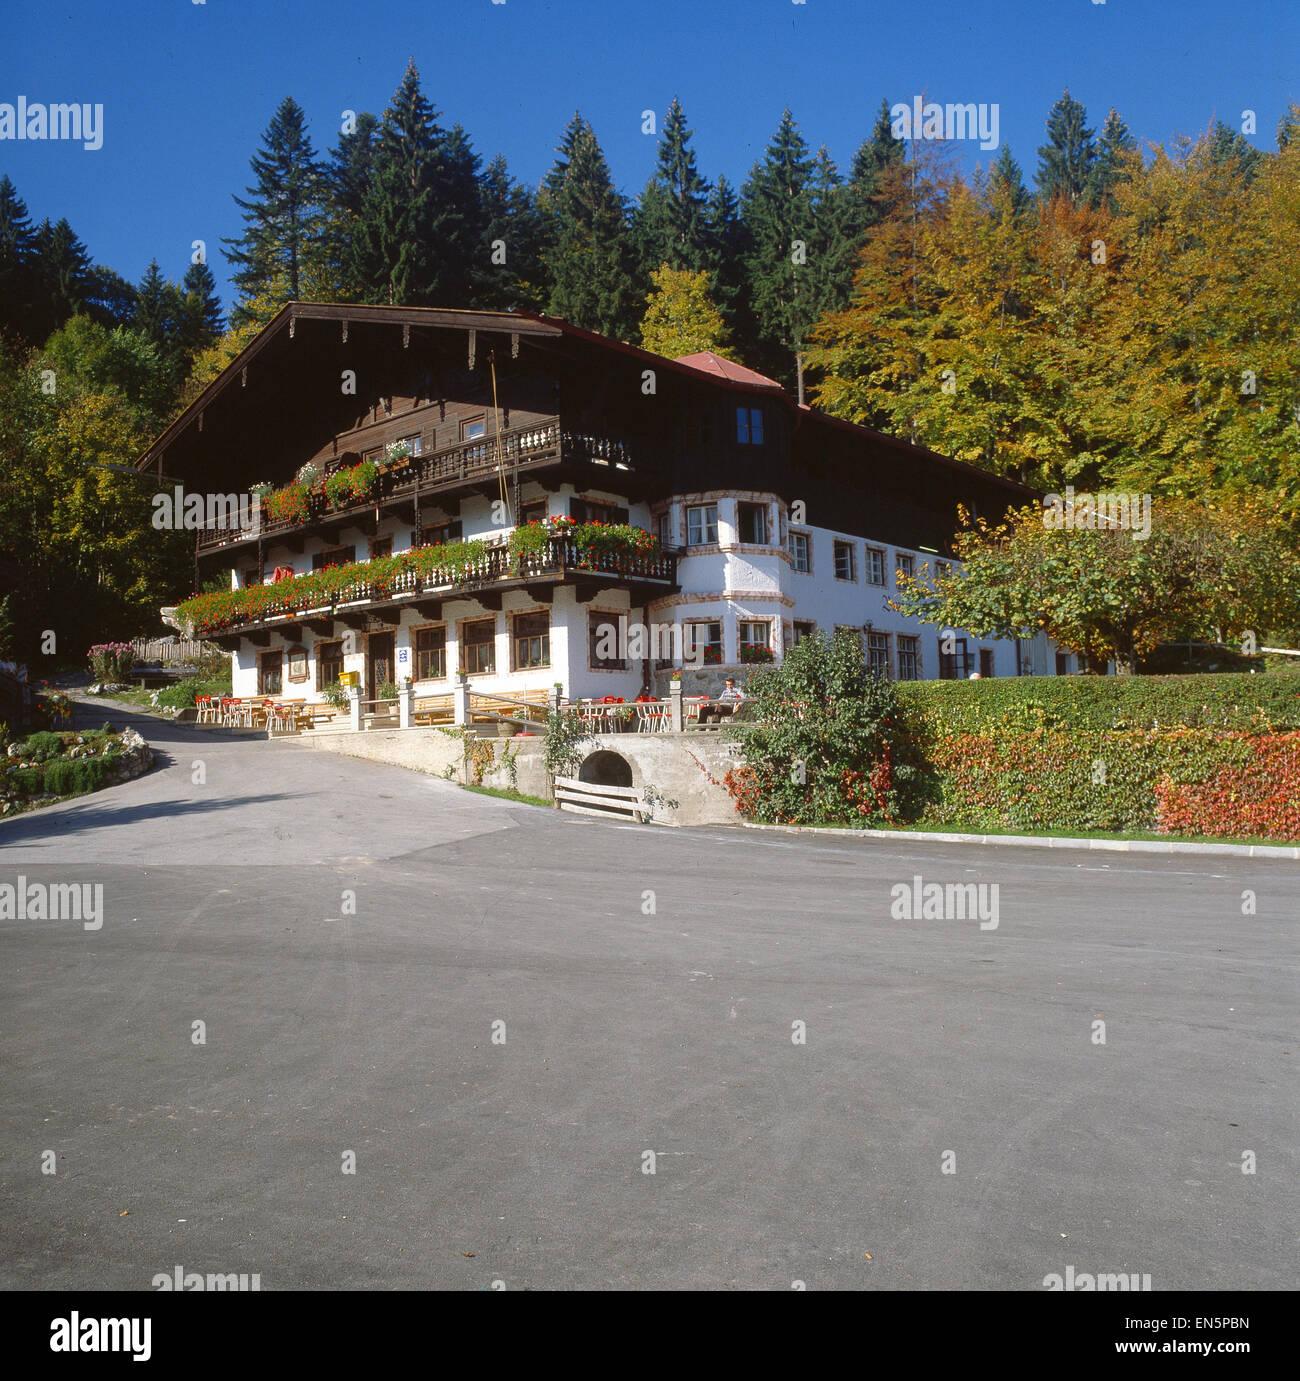 Deutschland, Bayern, Oberaudorf, Blick auf den Alpengasthof Tatzelwurm - Stock Image